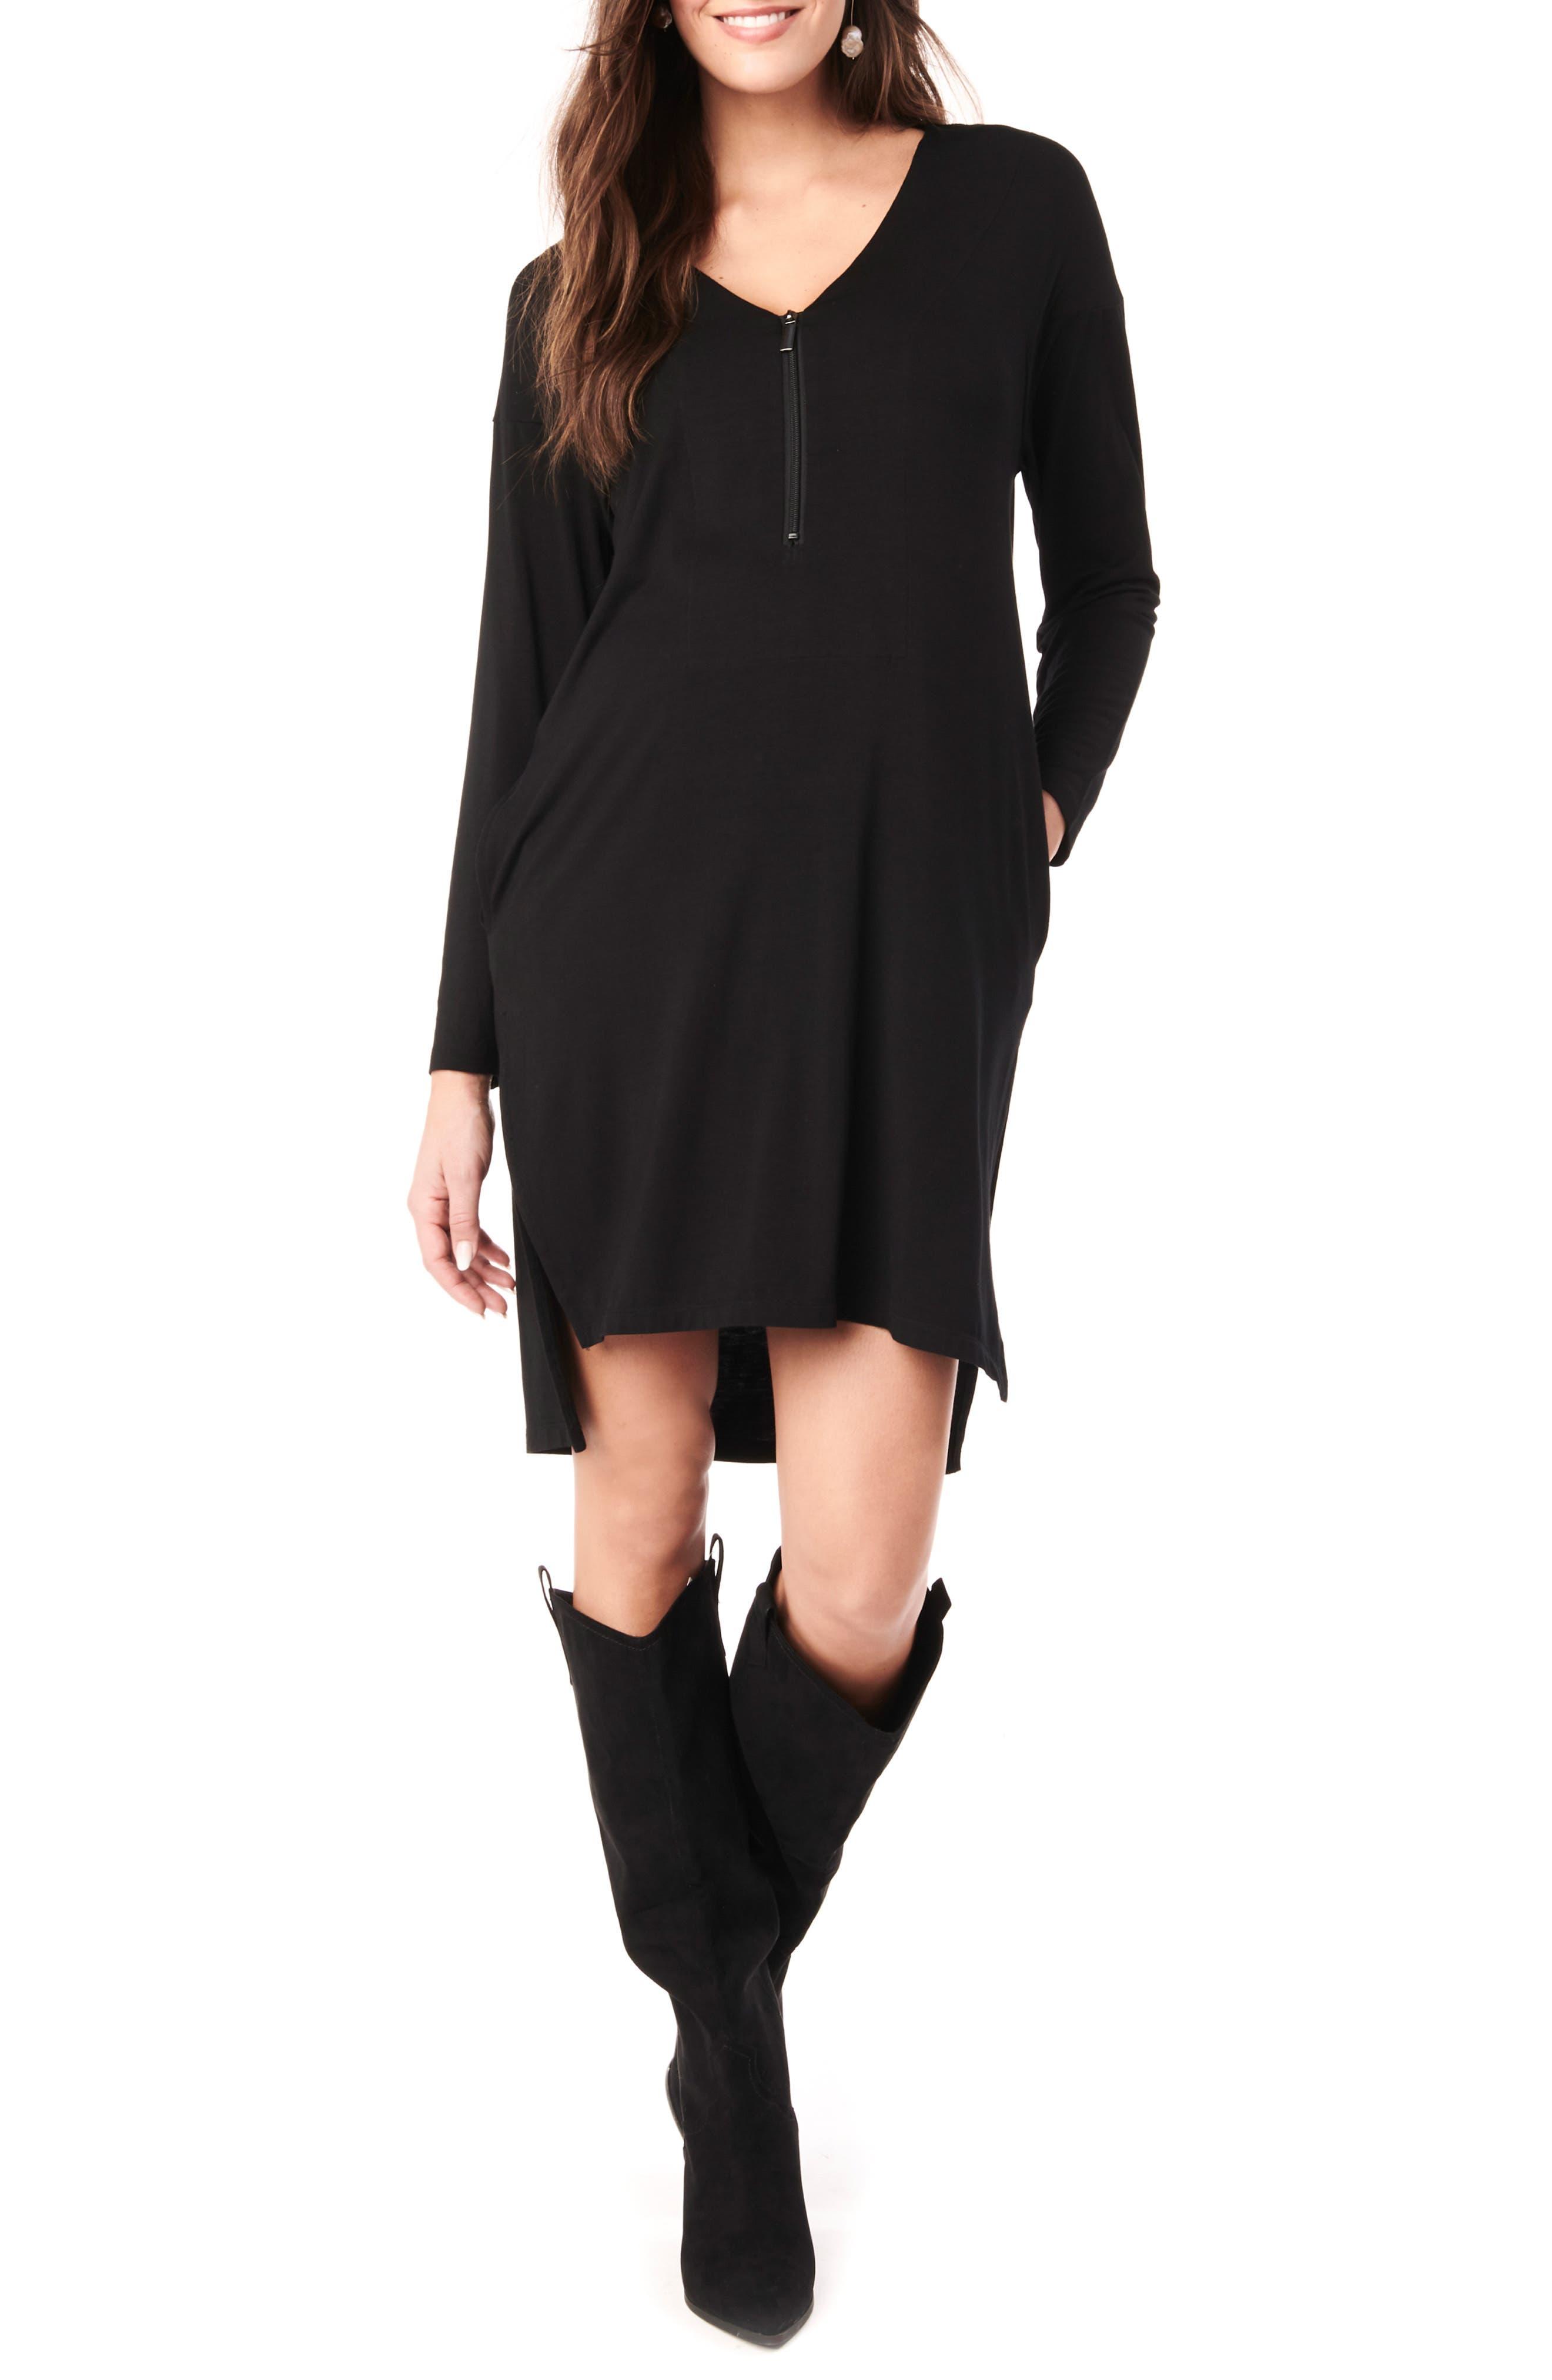 Farah V-Neck Long Sleeve Maternity Dress